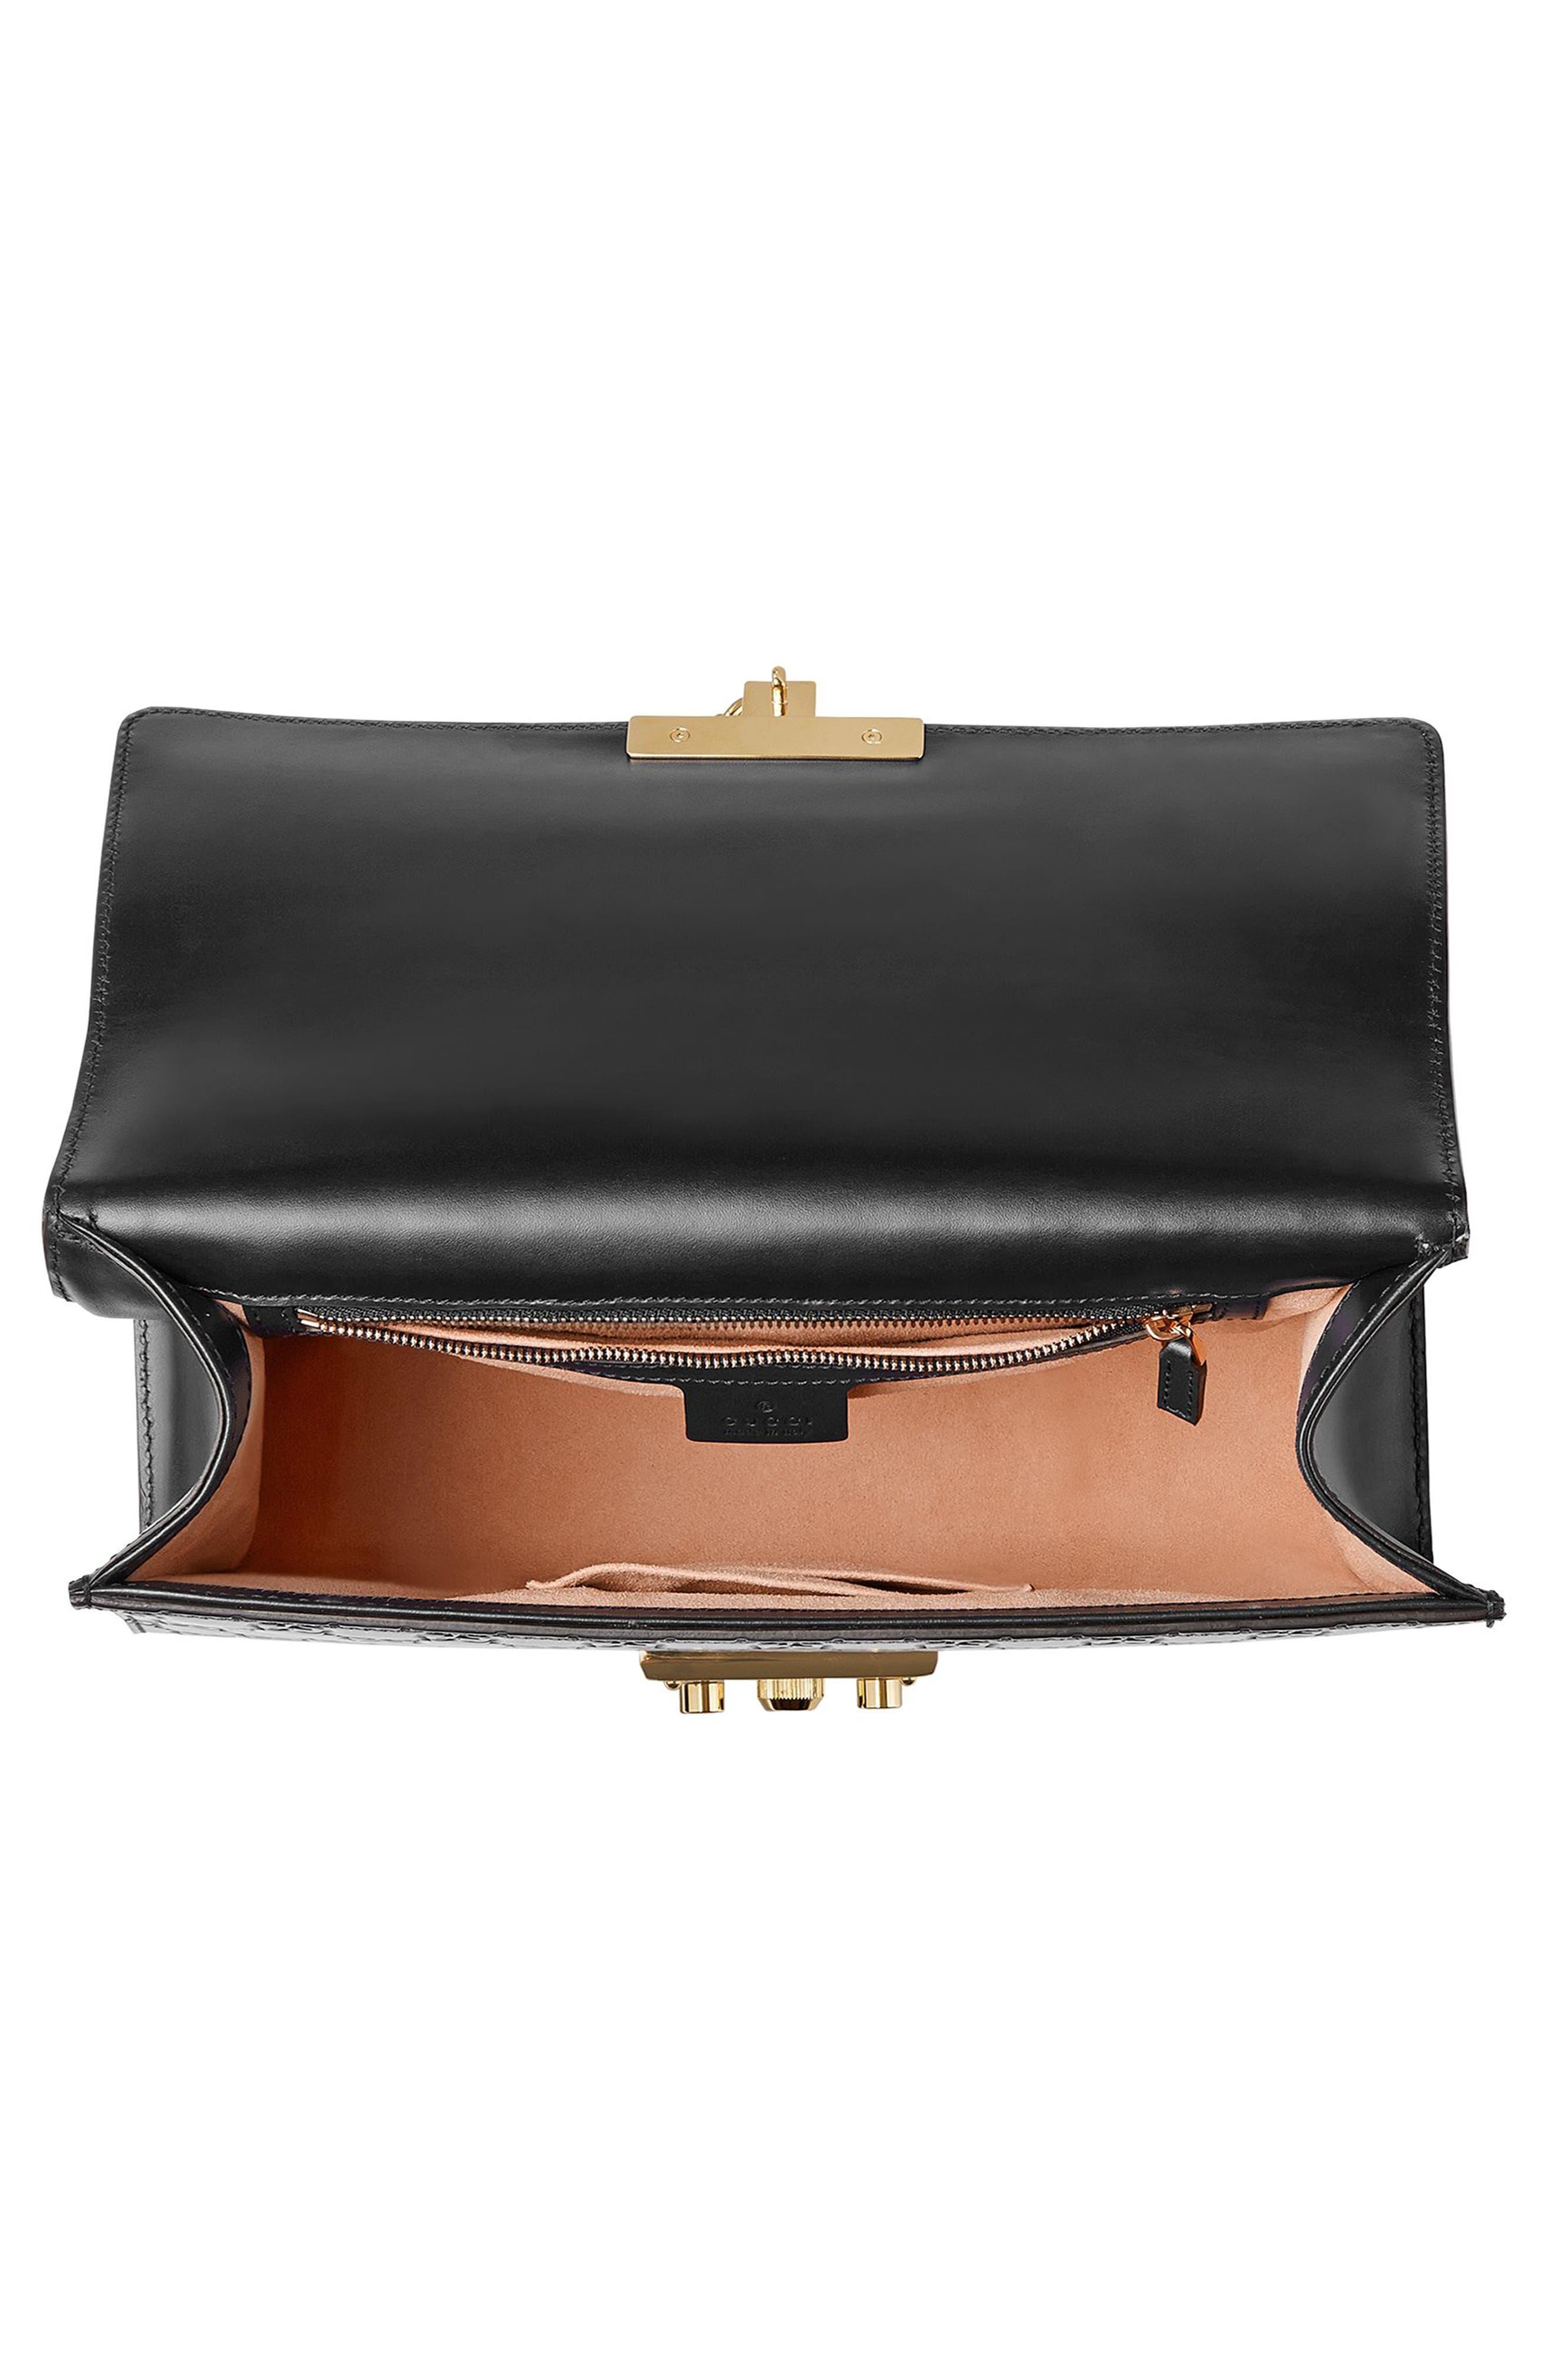 Medium Padlock Signature Leather Shoulder Bag,                             Alternate thumbnail 3, color,                             NERO